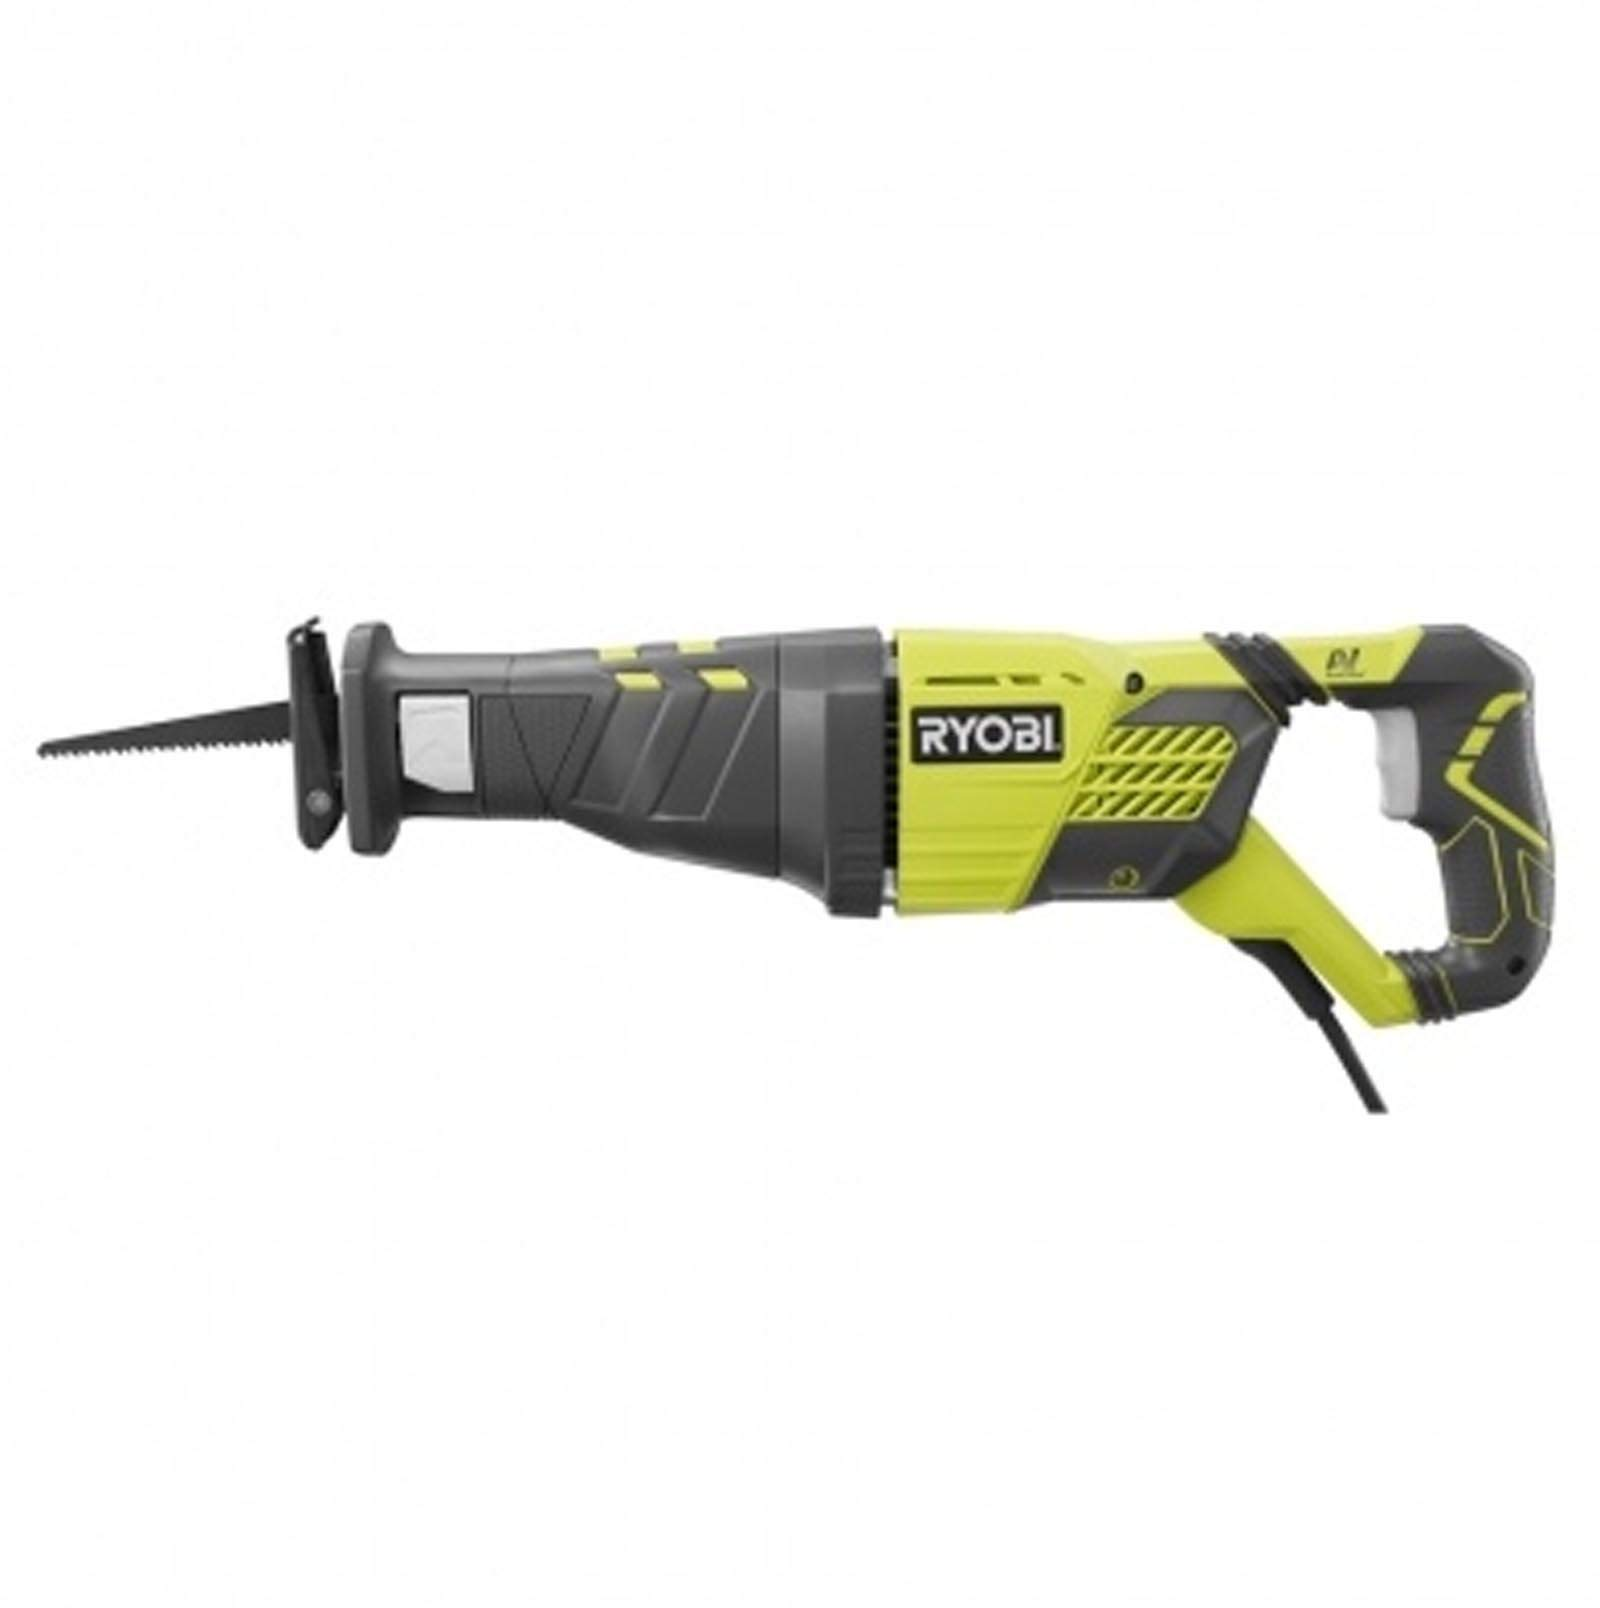 Ryobi ZRRJ185V 120V 10Amp Variable Speed Electric Reciprocating Saw w/Blade (Certified Refurbished)